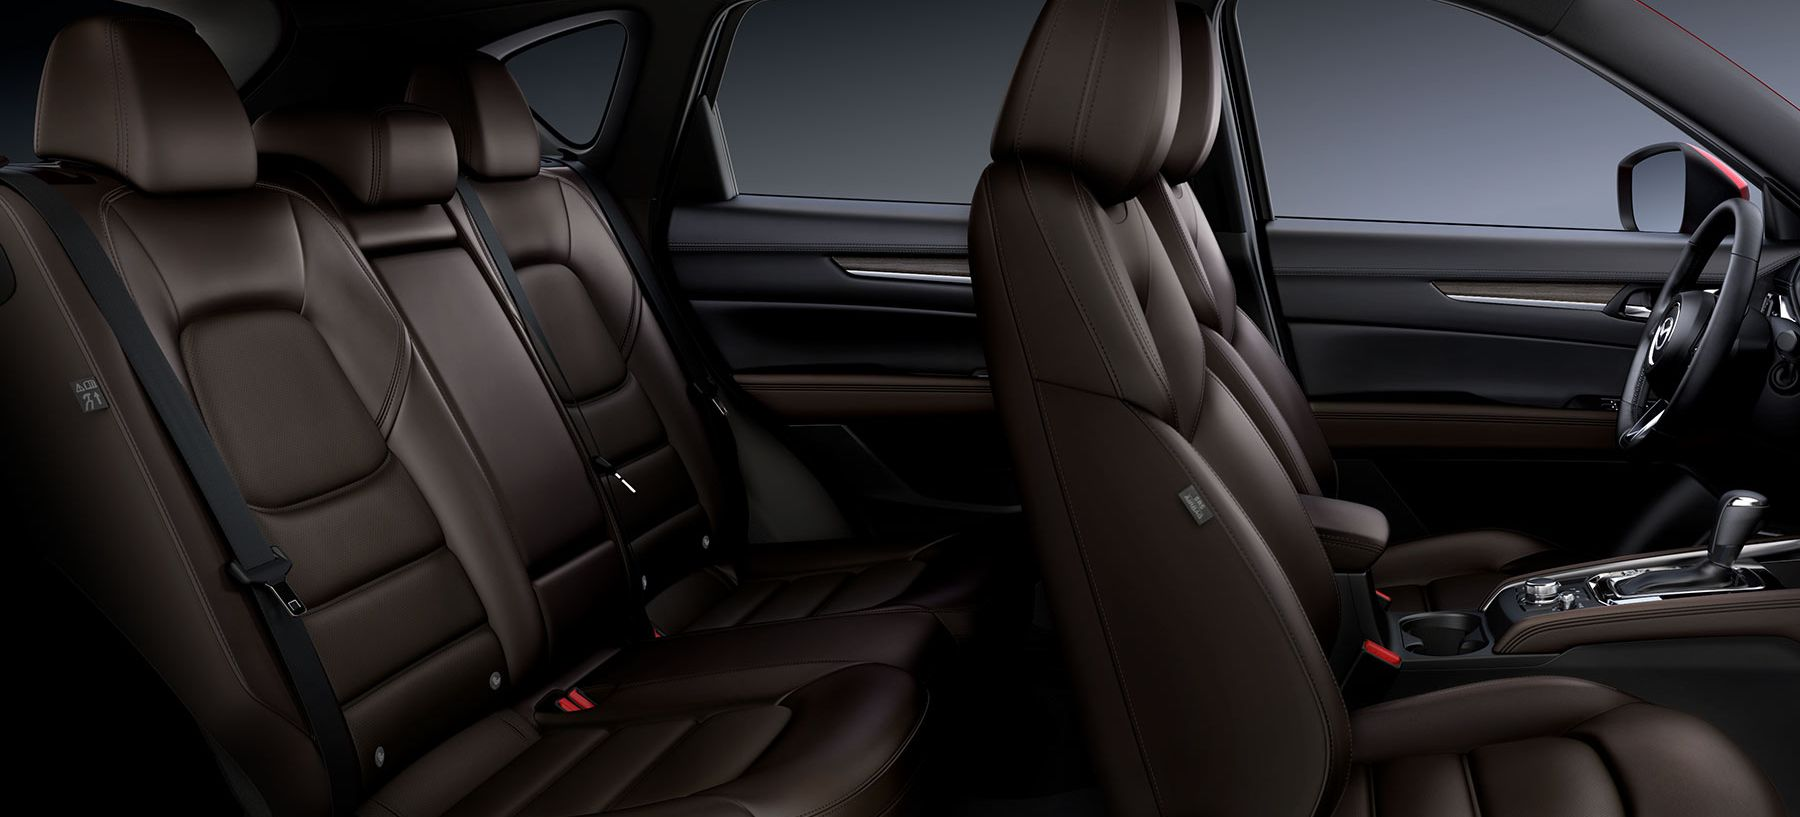 The Roomy Interior of the 2019 Mazda CX-5